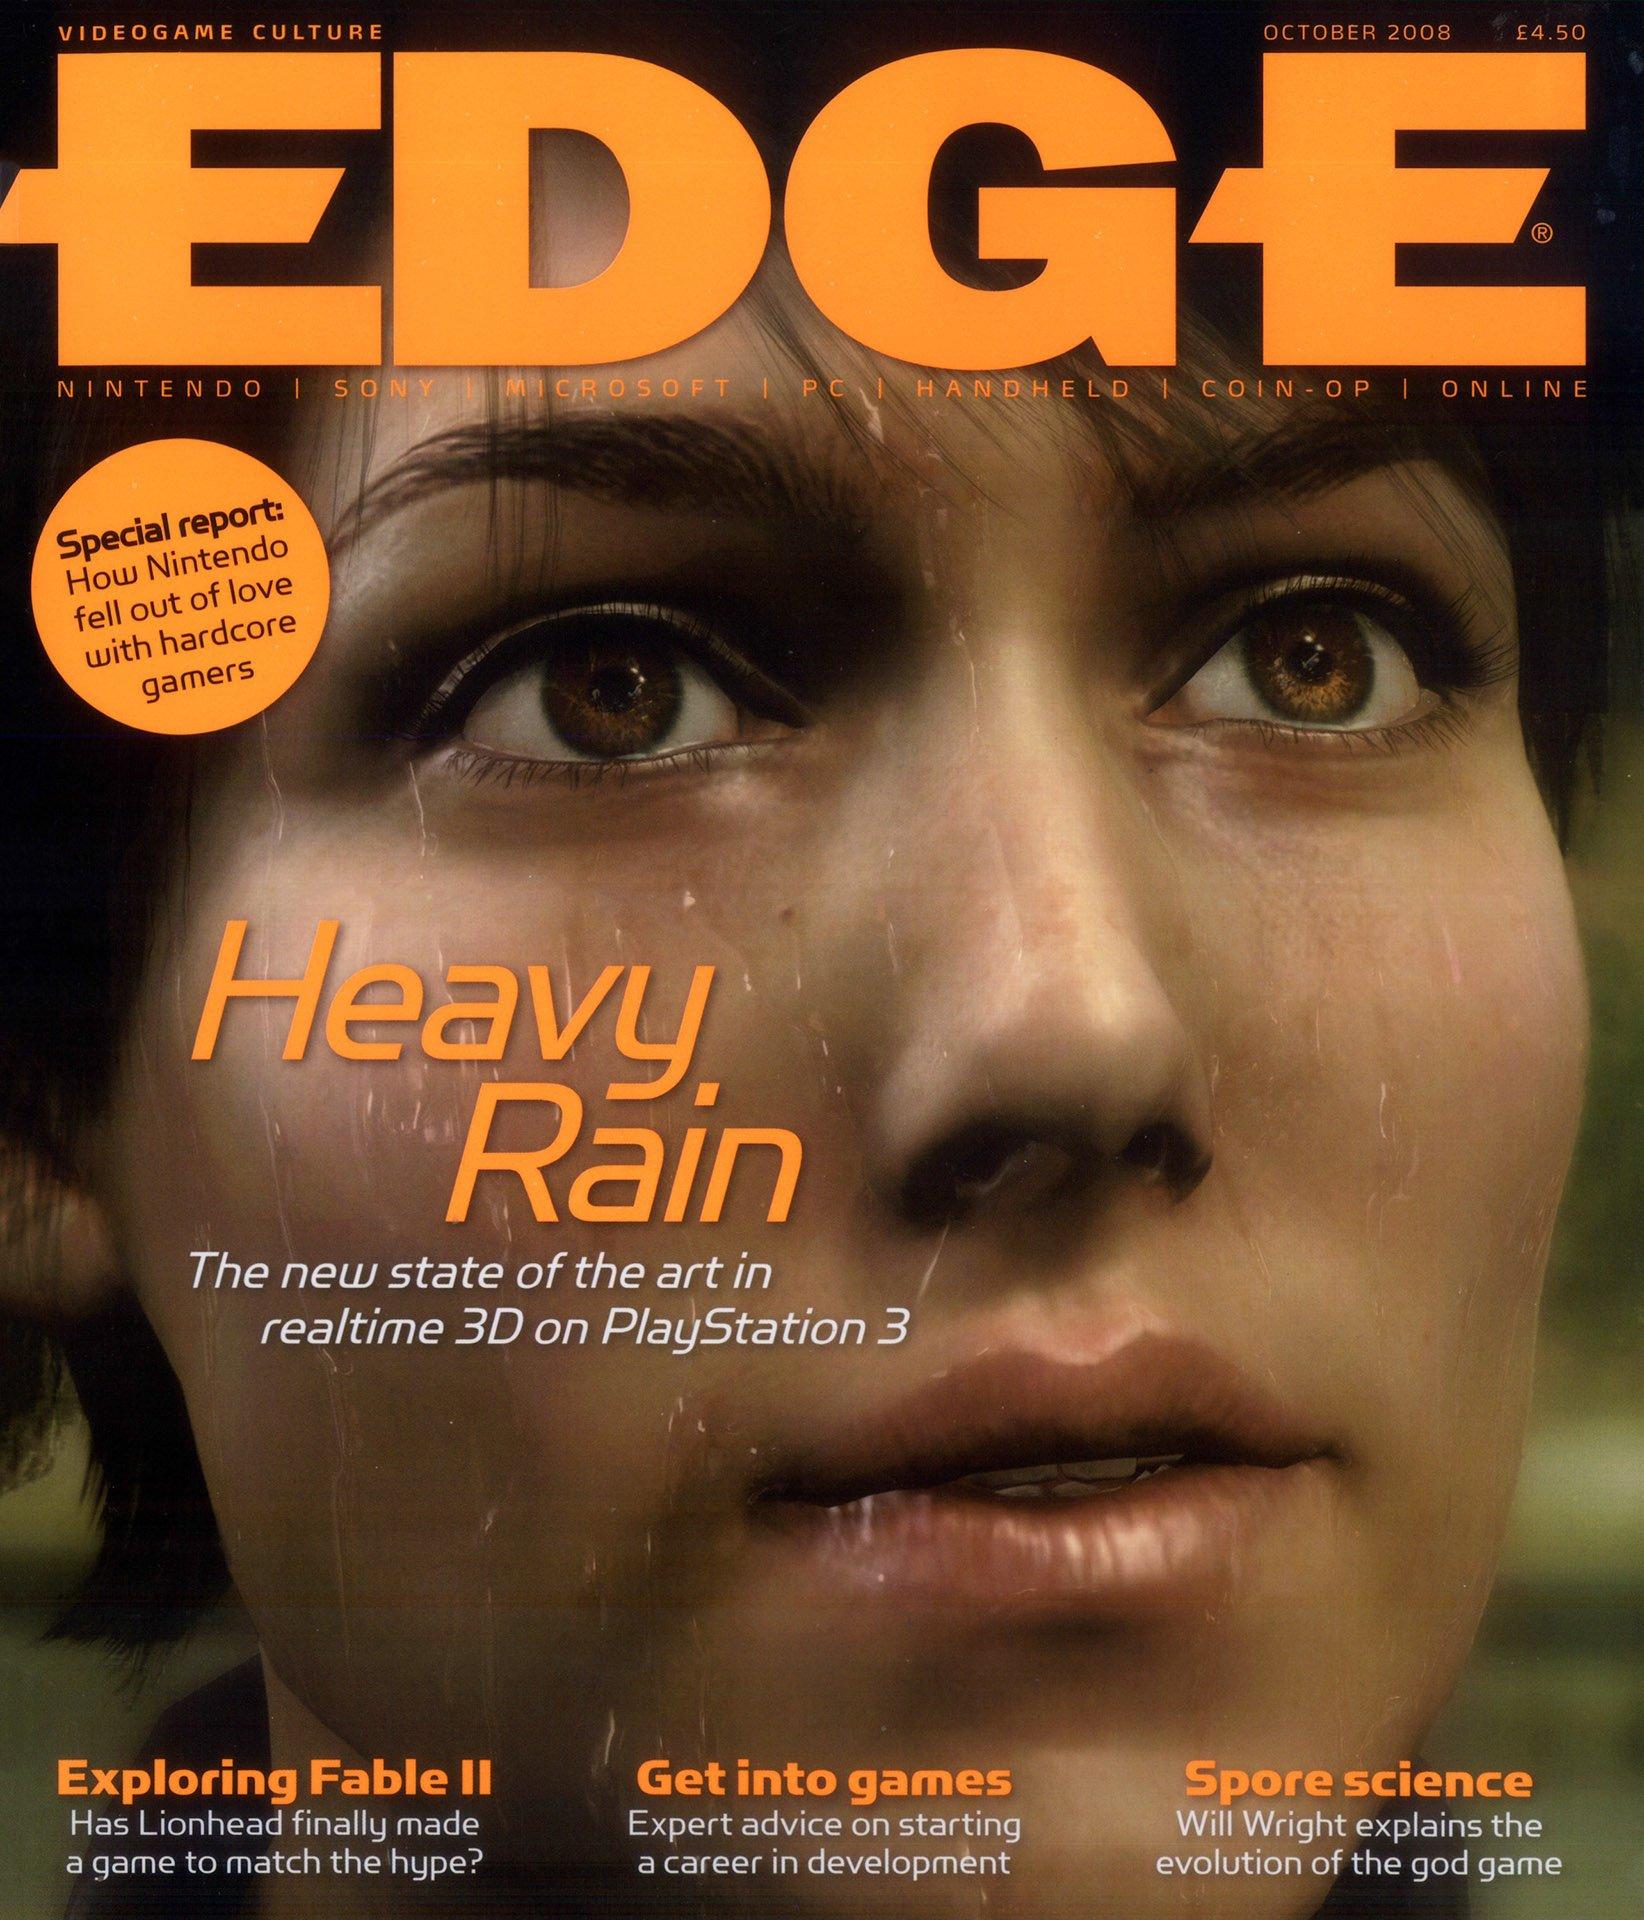 Edge 193 (October 2008)